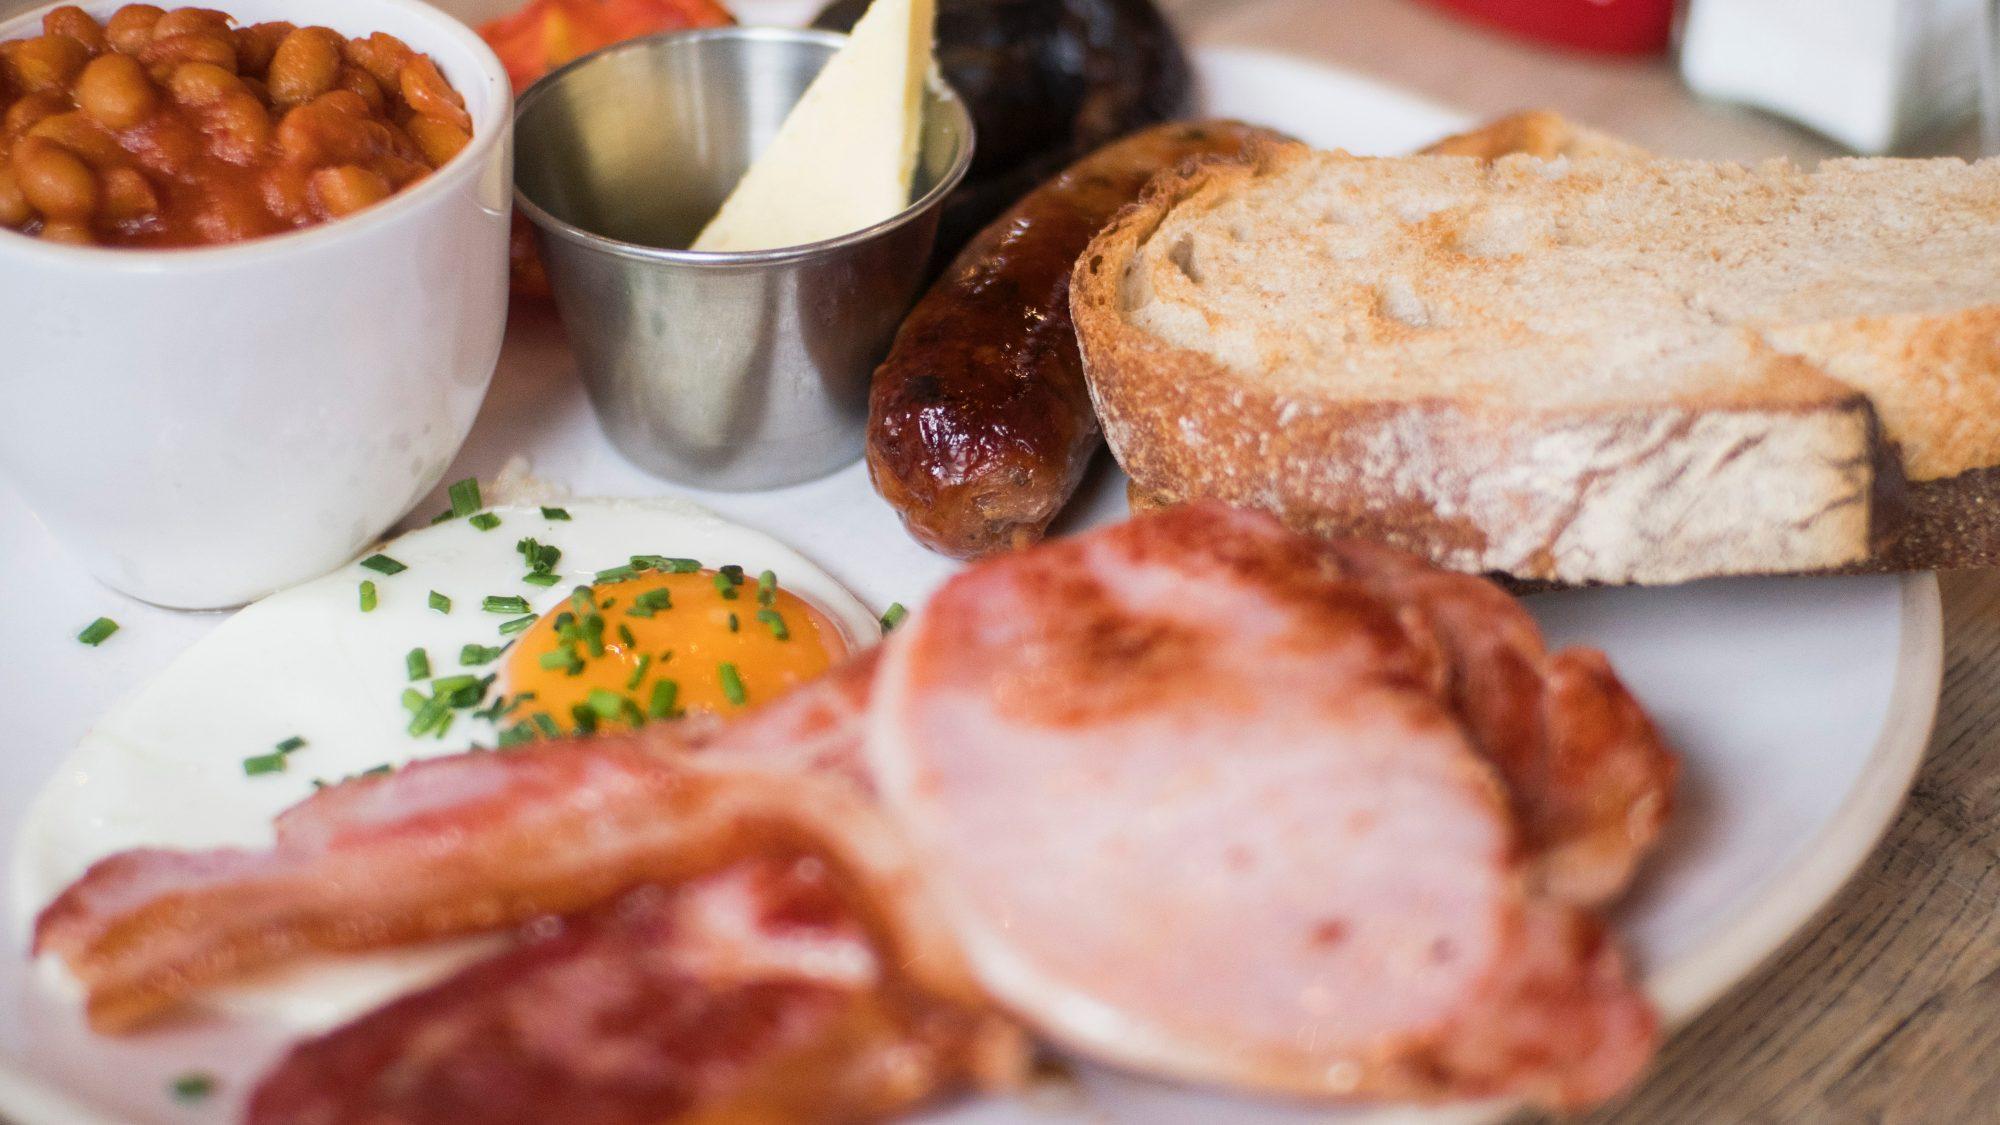 English Breakfast Unsplash